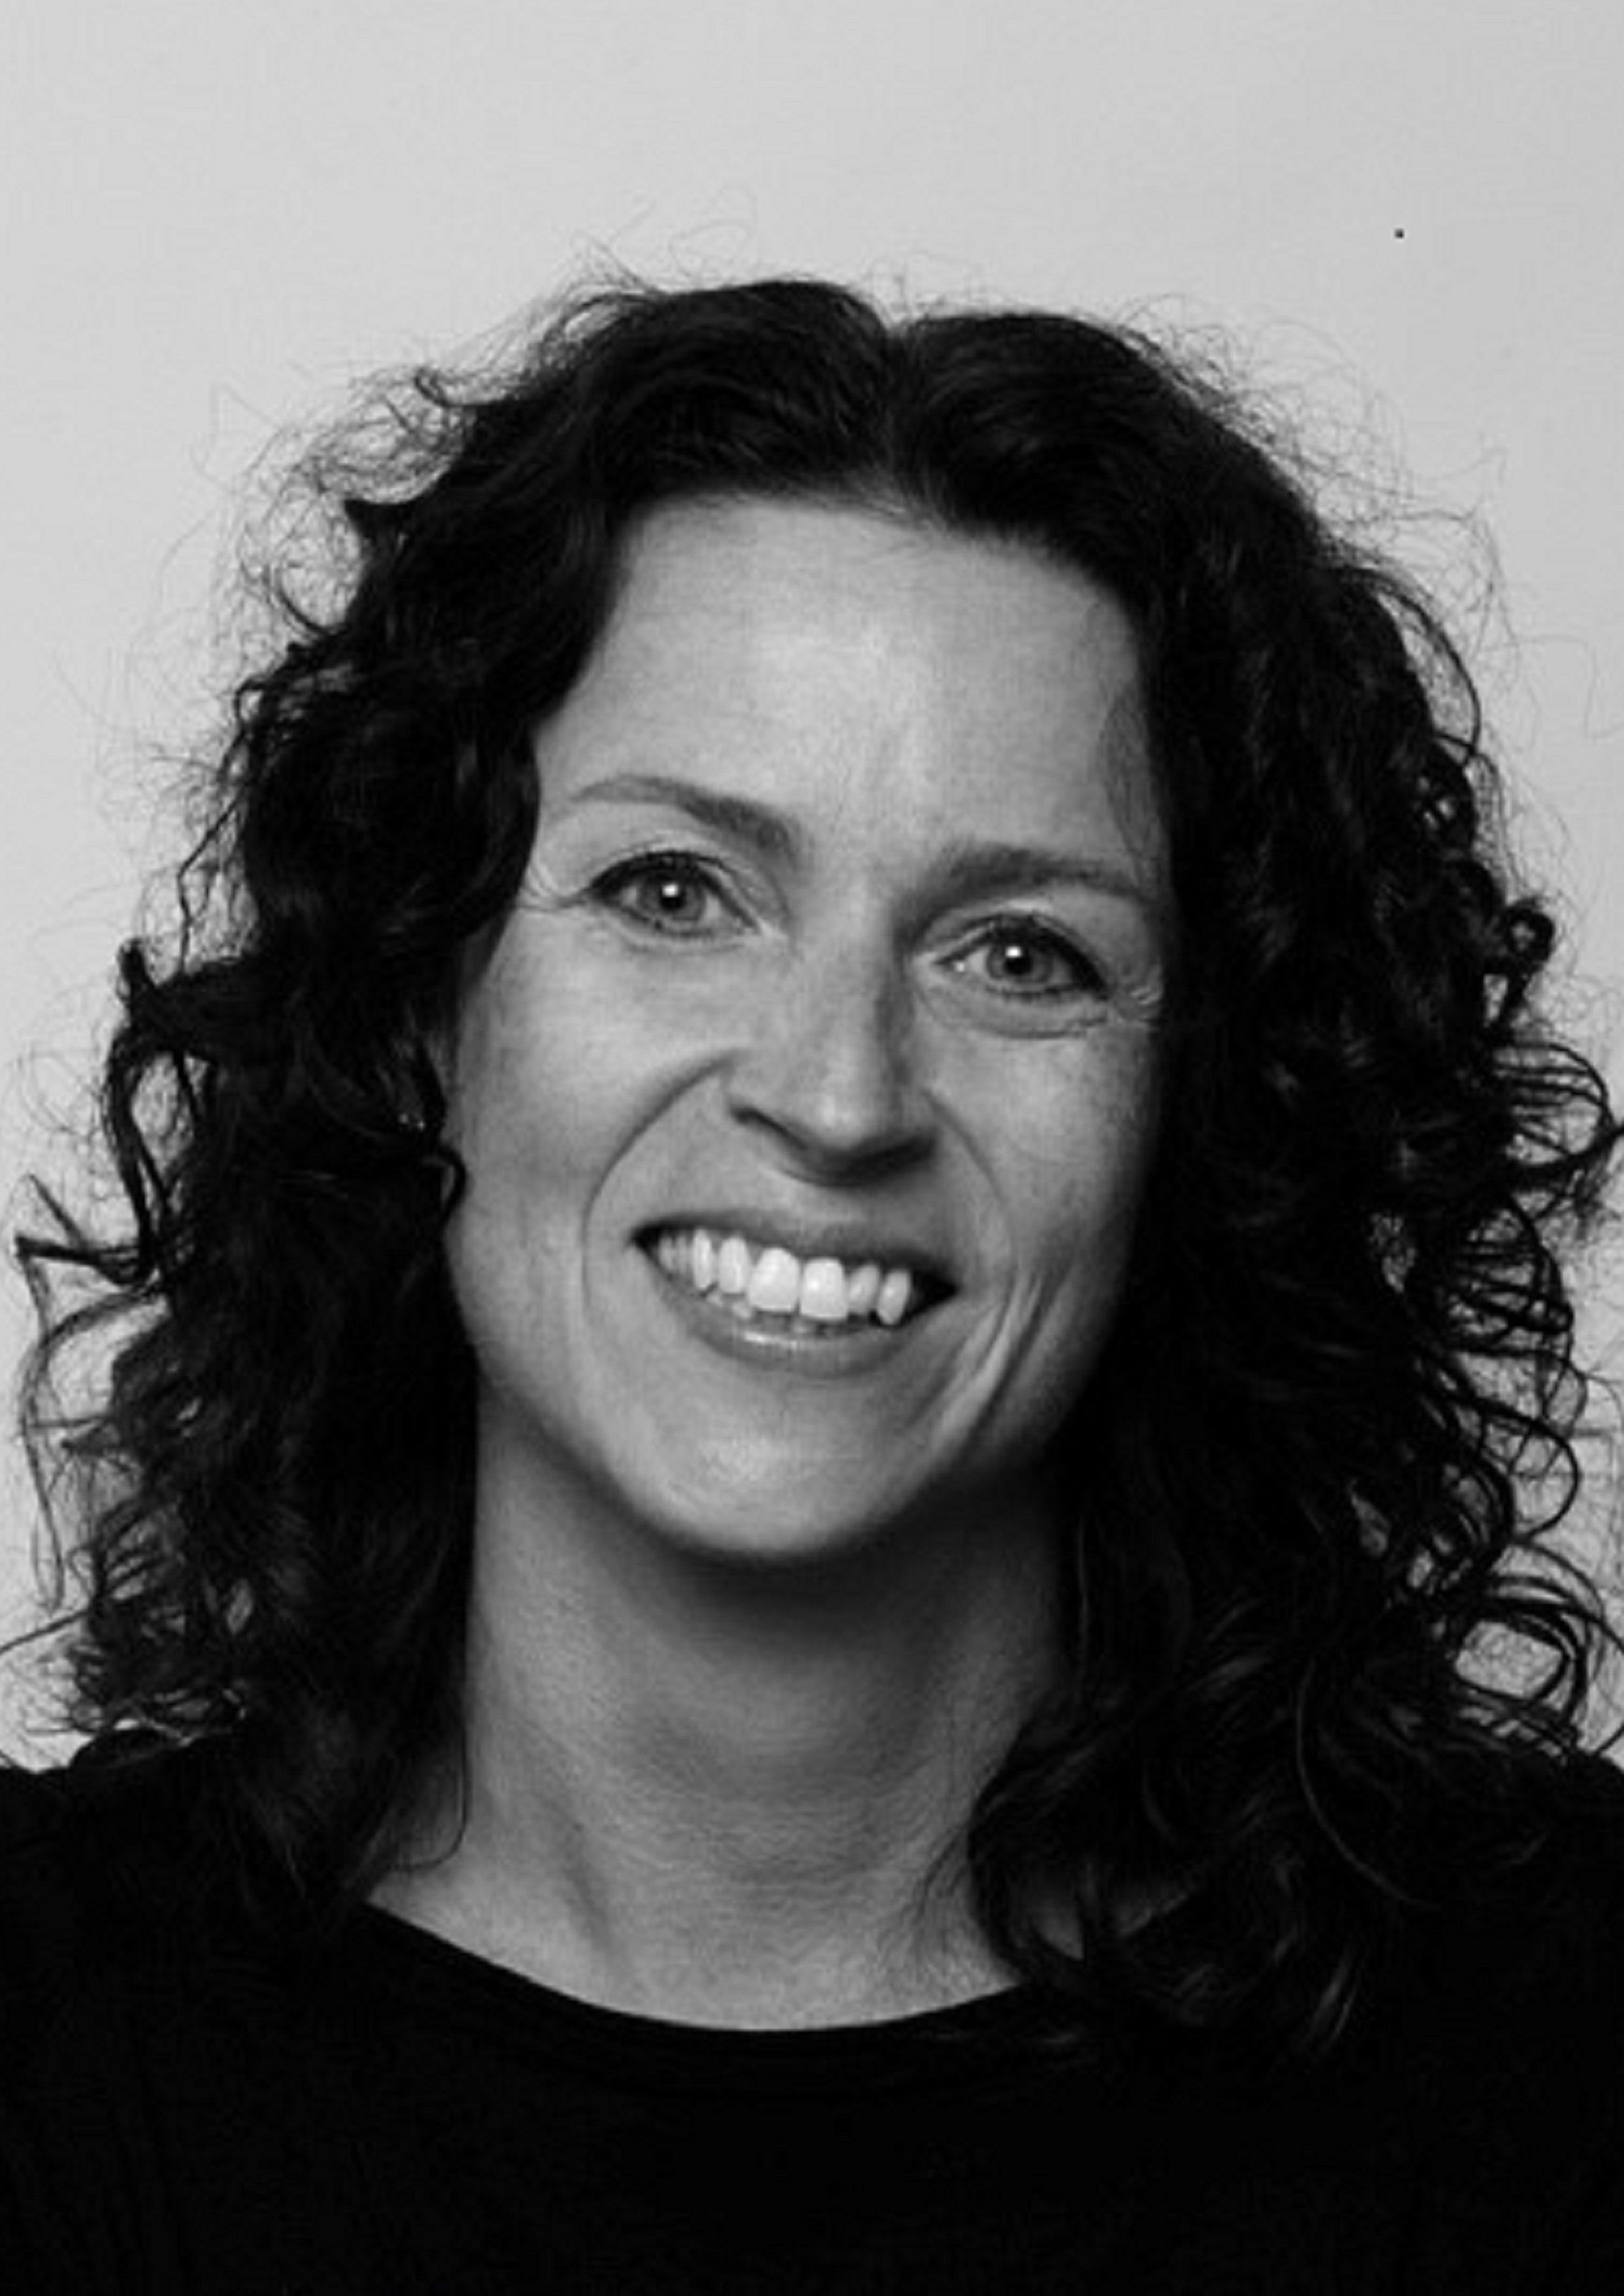 Marketing Manager, Zleep Hotels, Bettina Wähling